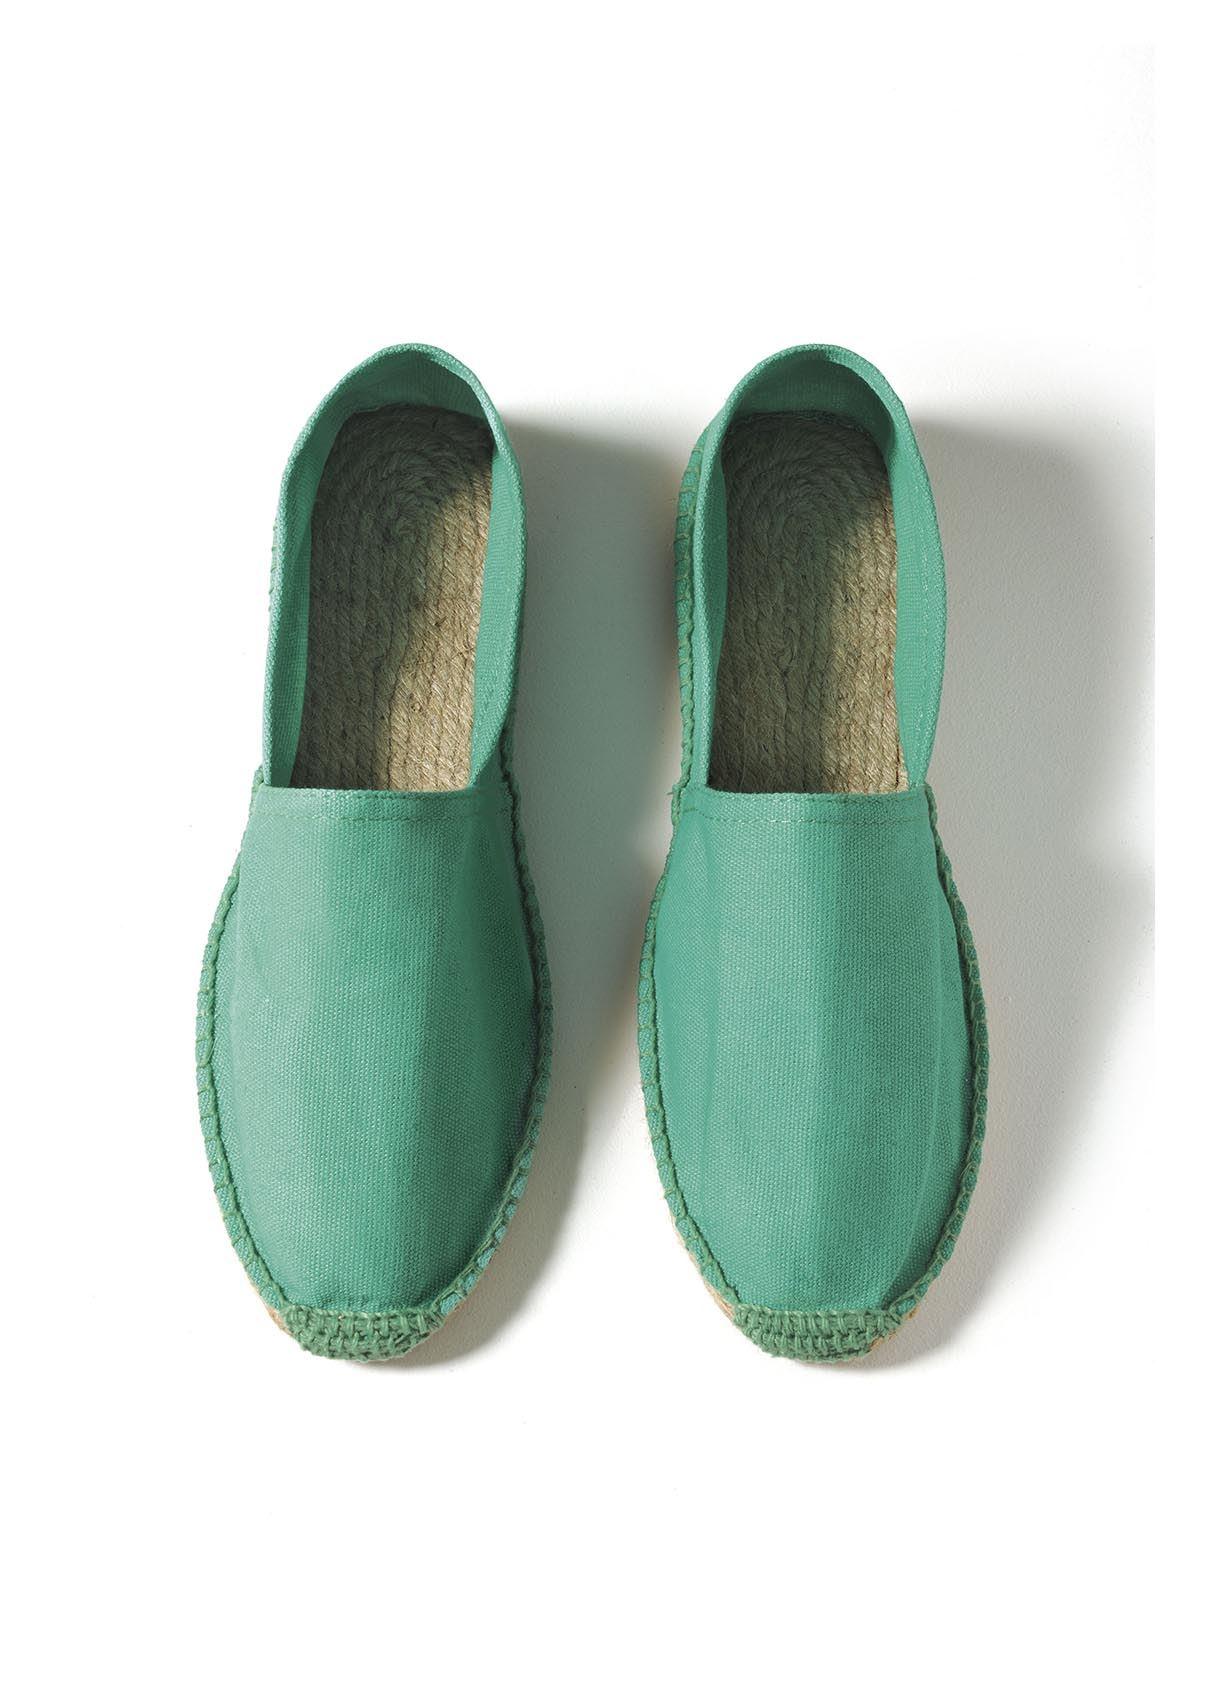 B&C Paradise B&C espadrille /men shoes holiday summer size 6.5 - 9